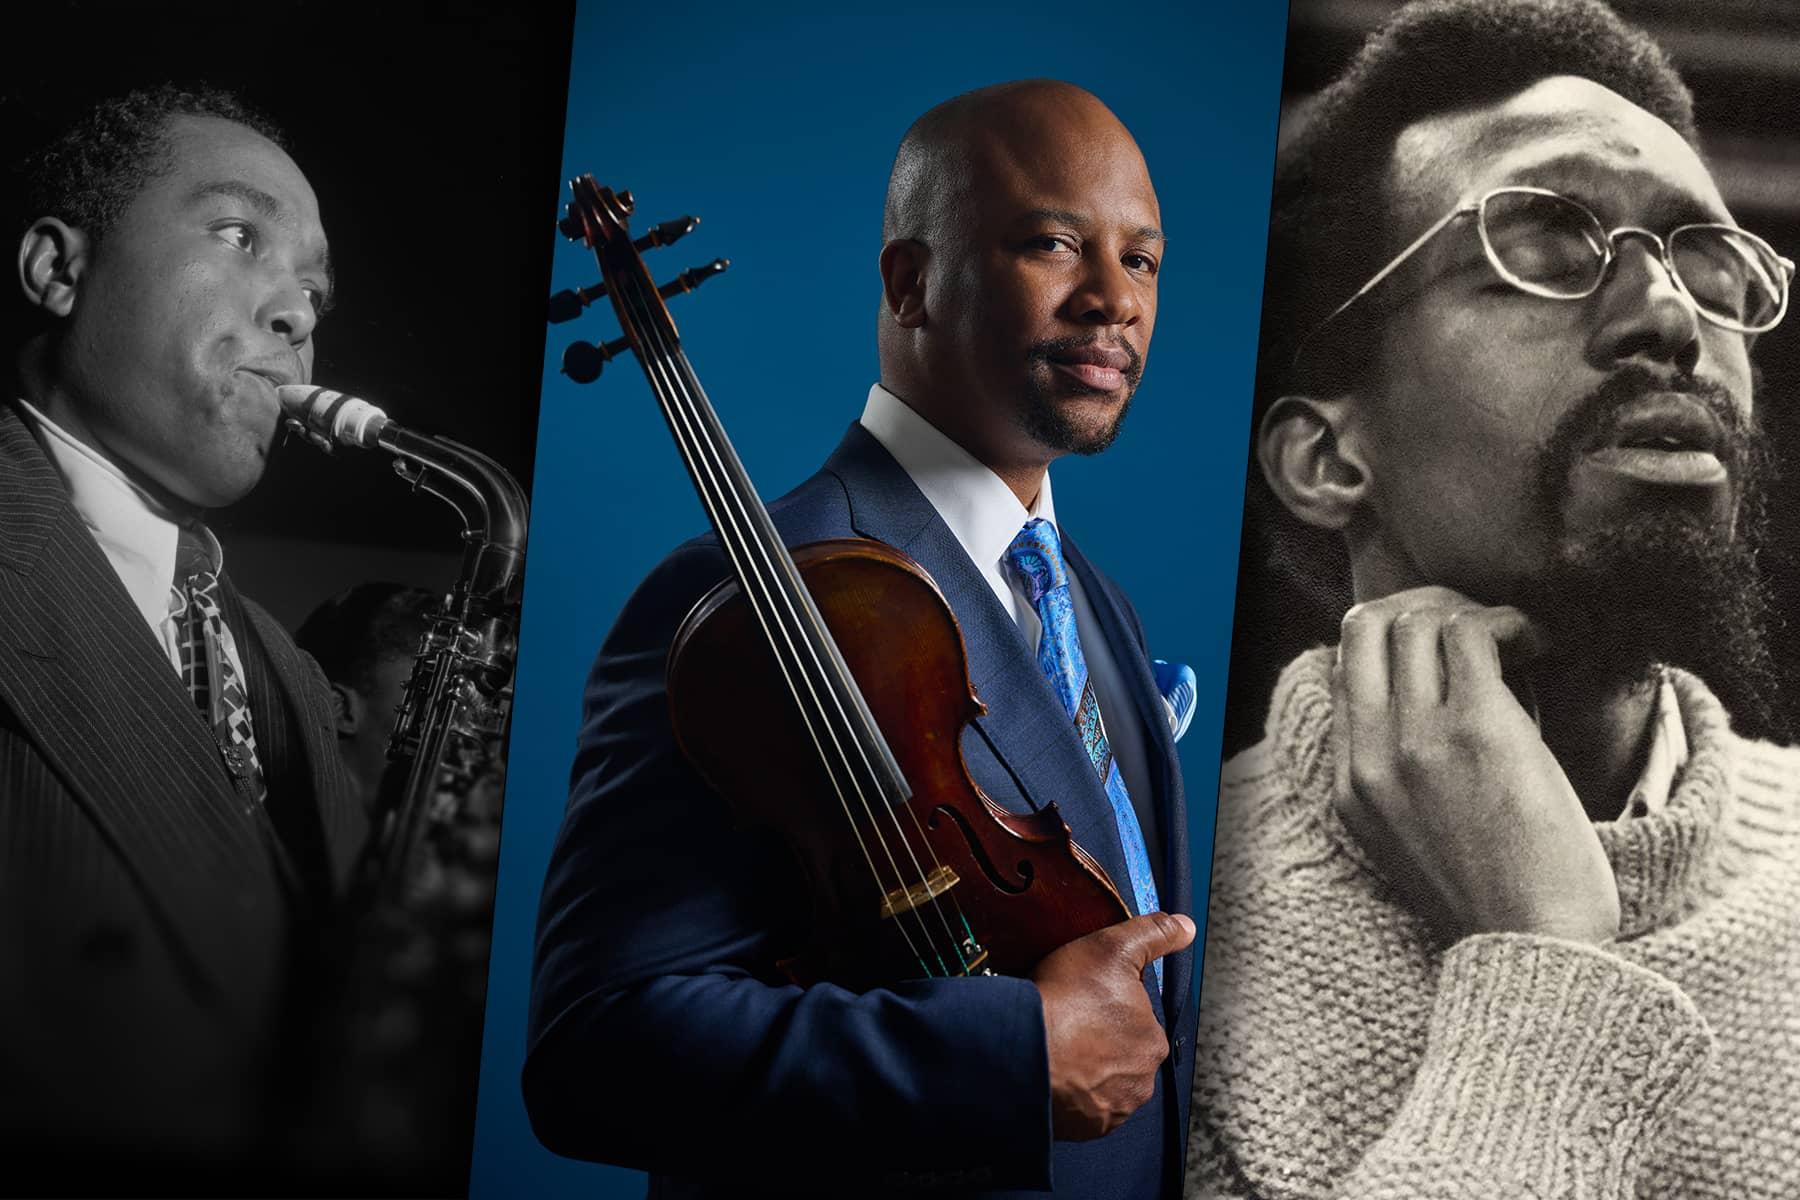 Images of Charlie Parker, Dr. Quinton Morris, and Julius Eastman.